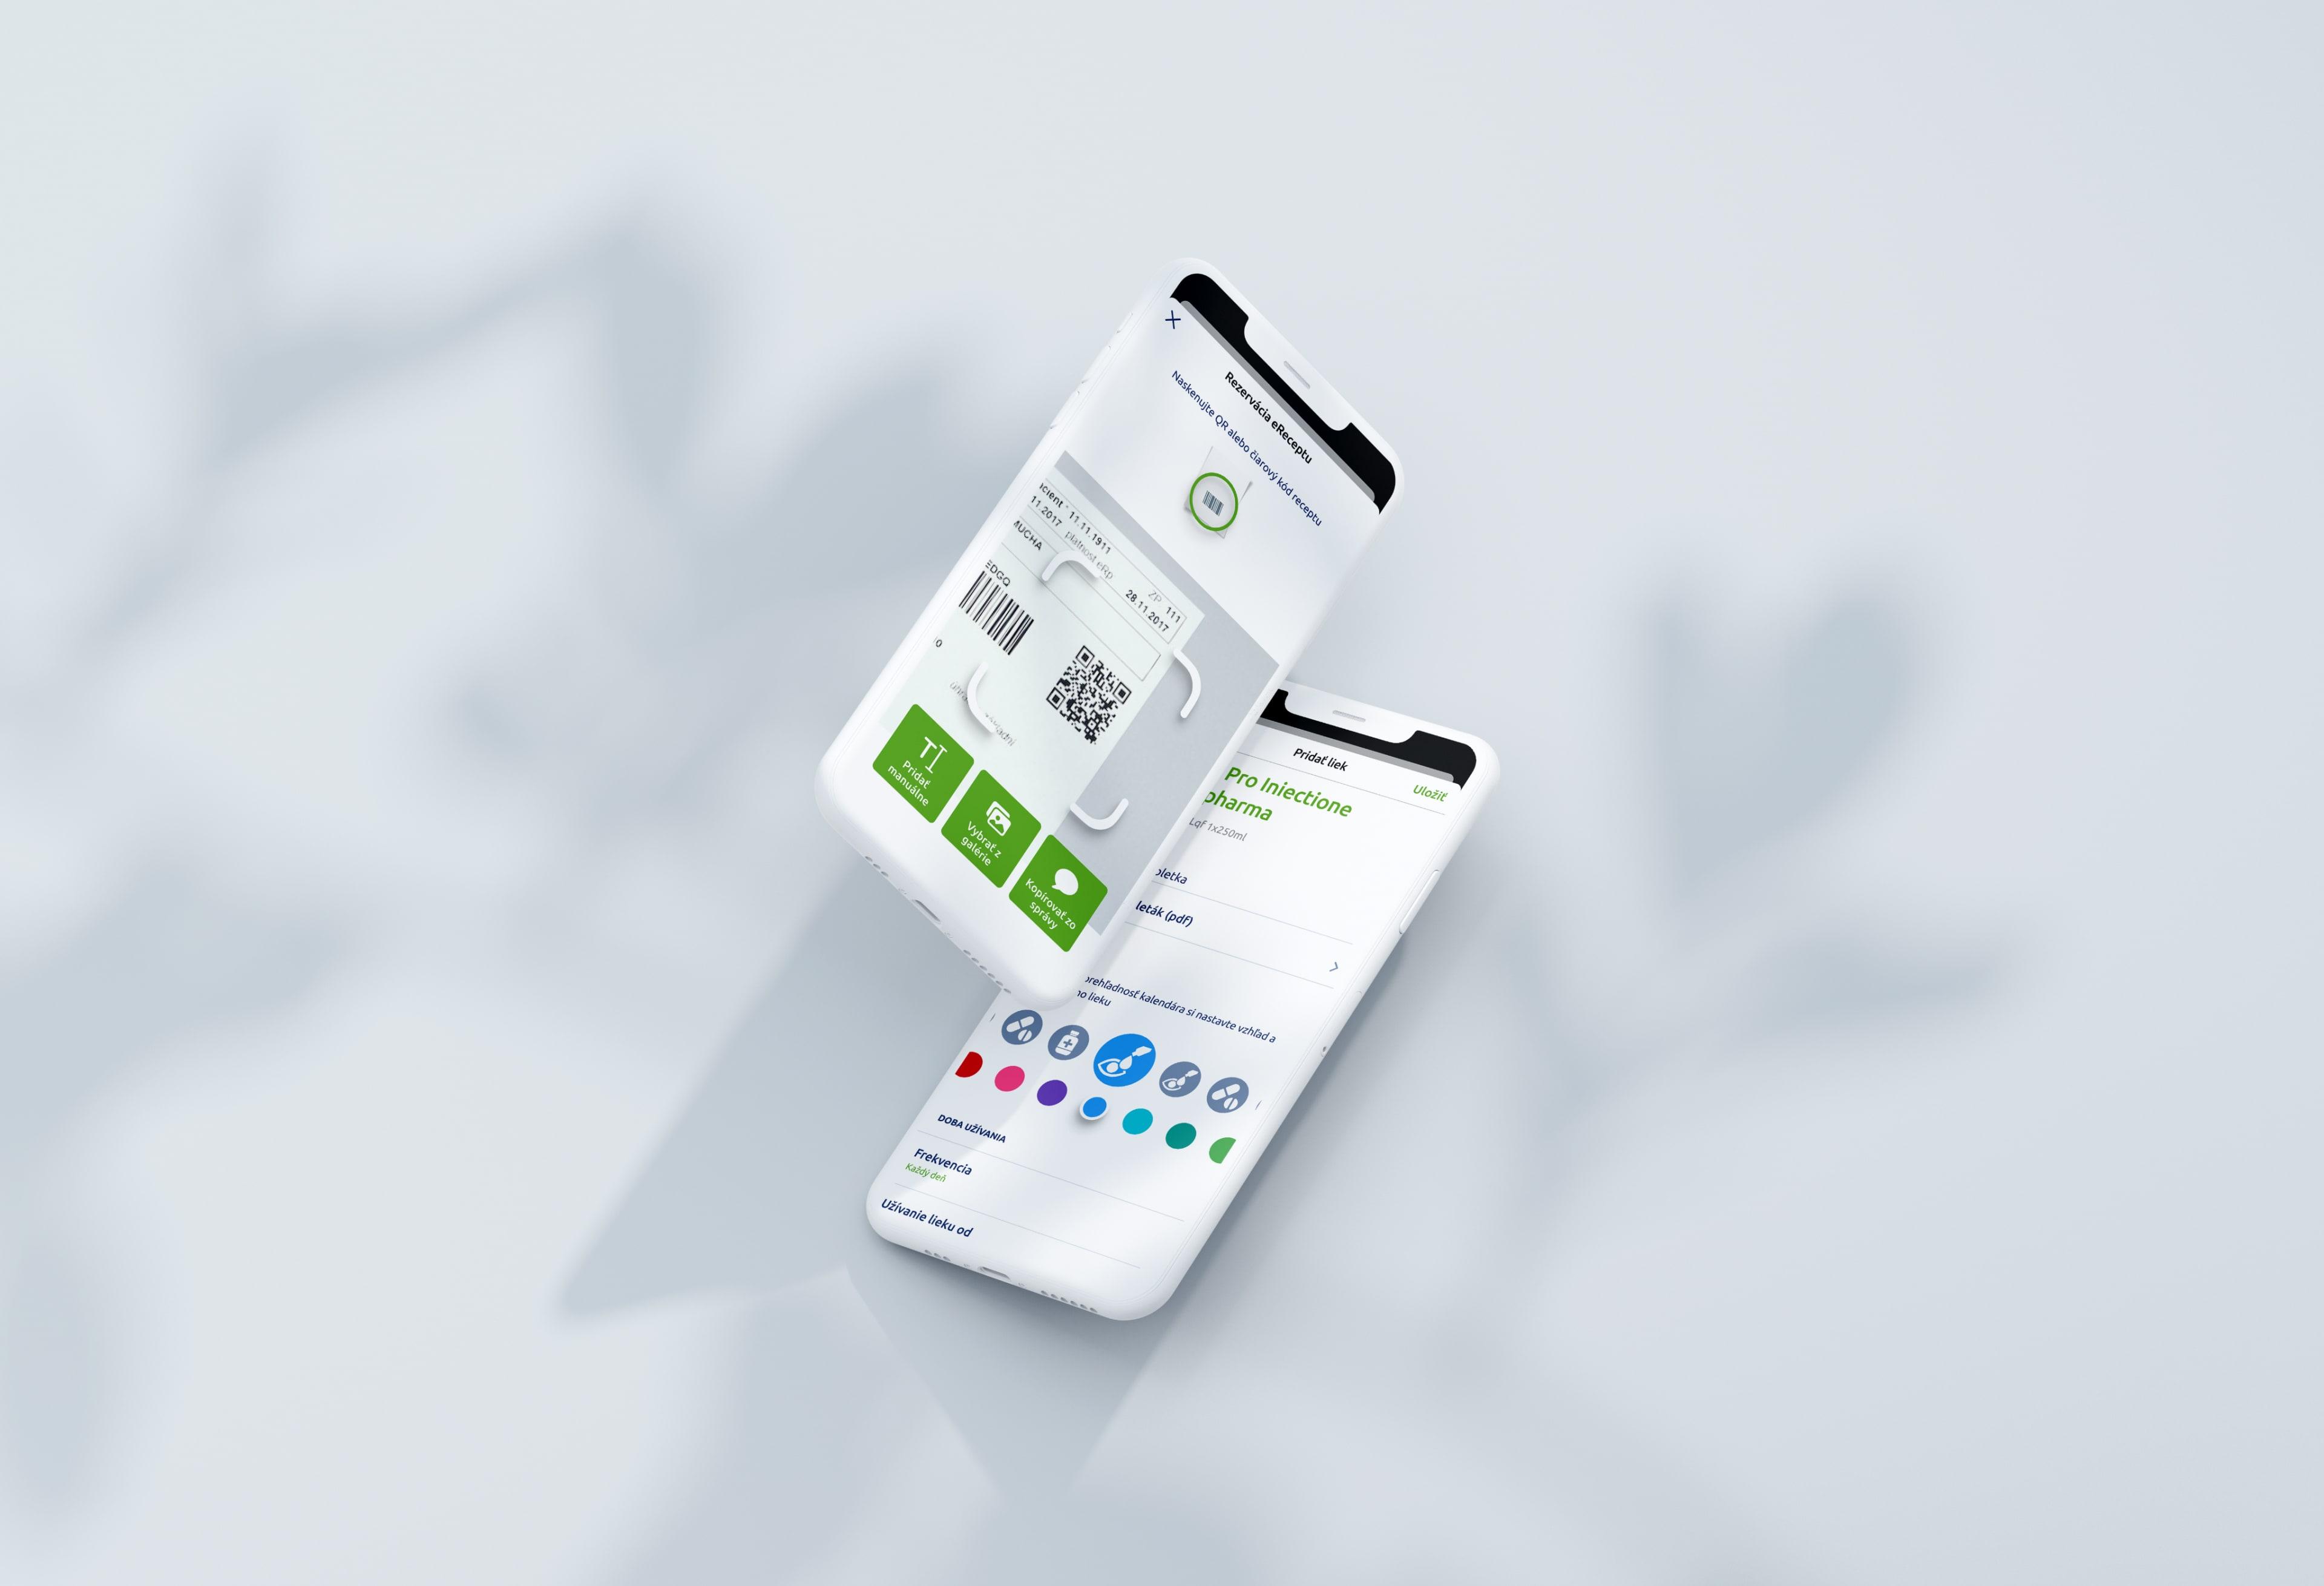 tipsport extraliga fantasy liga mobilná aplikácia pre fanúšikov hokeja | mobile apllication for hocke fans | Goodrequest